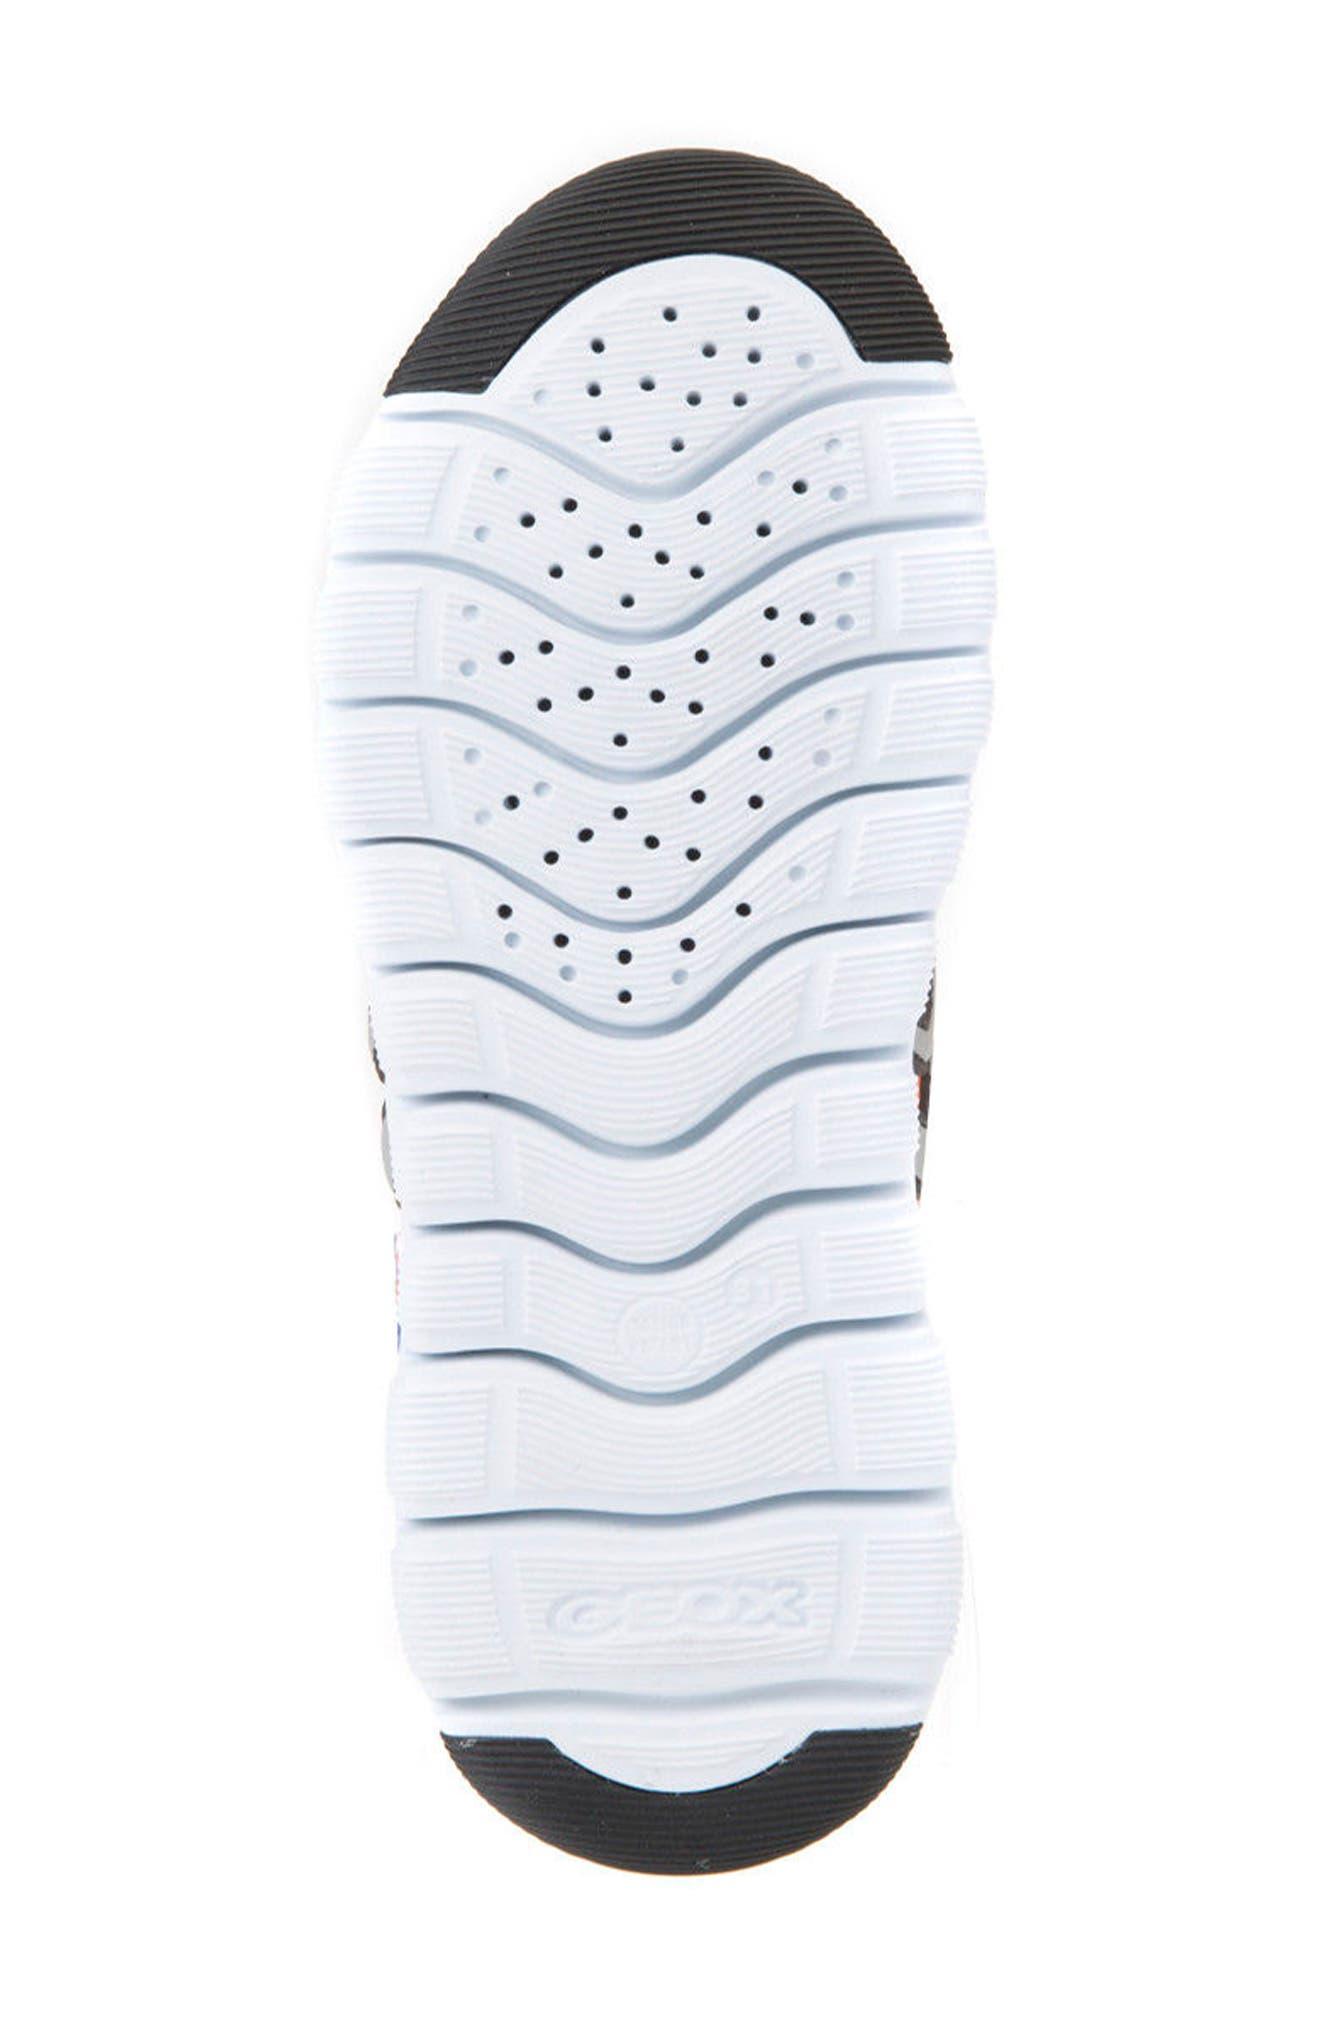 Xunday Low Top Sneaker,                             Alternate thumbnail 6, color,                             001